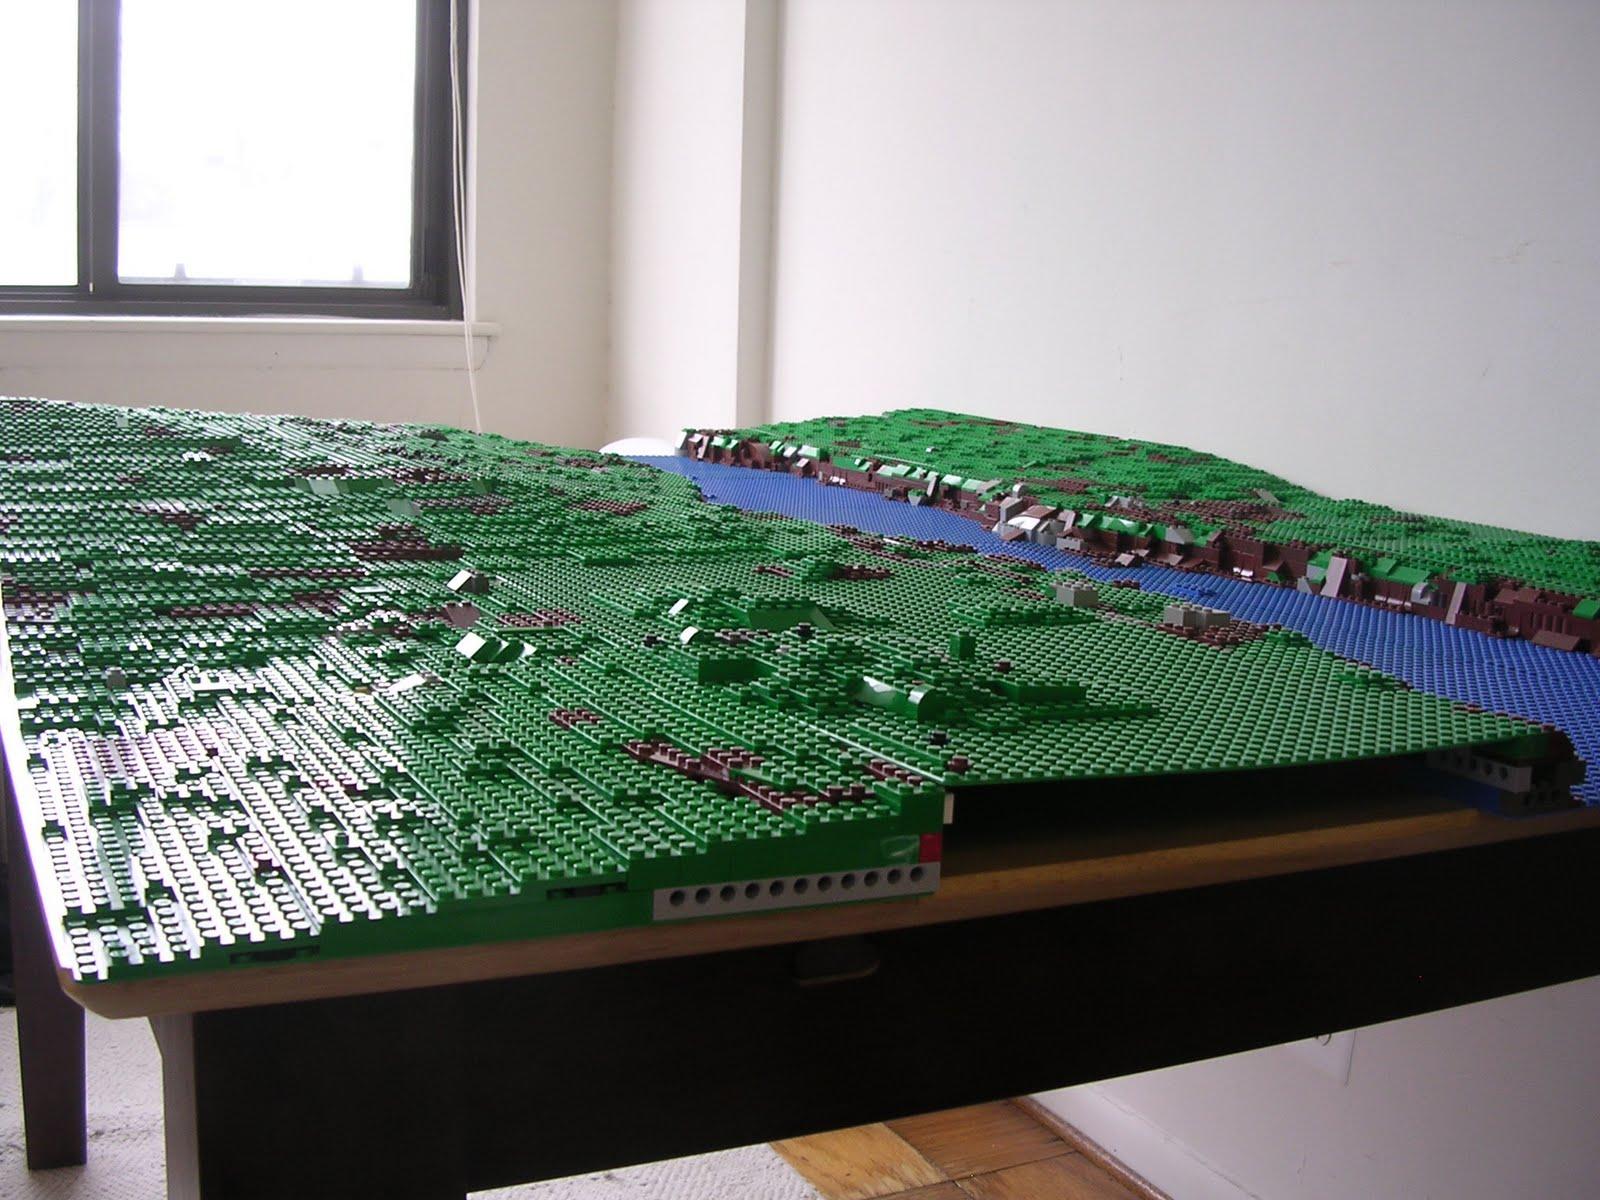 LEGO Military Models: Modular Landscaping and BrickFair ...